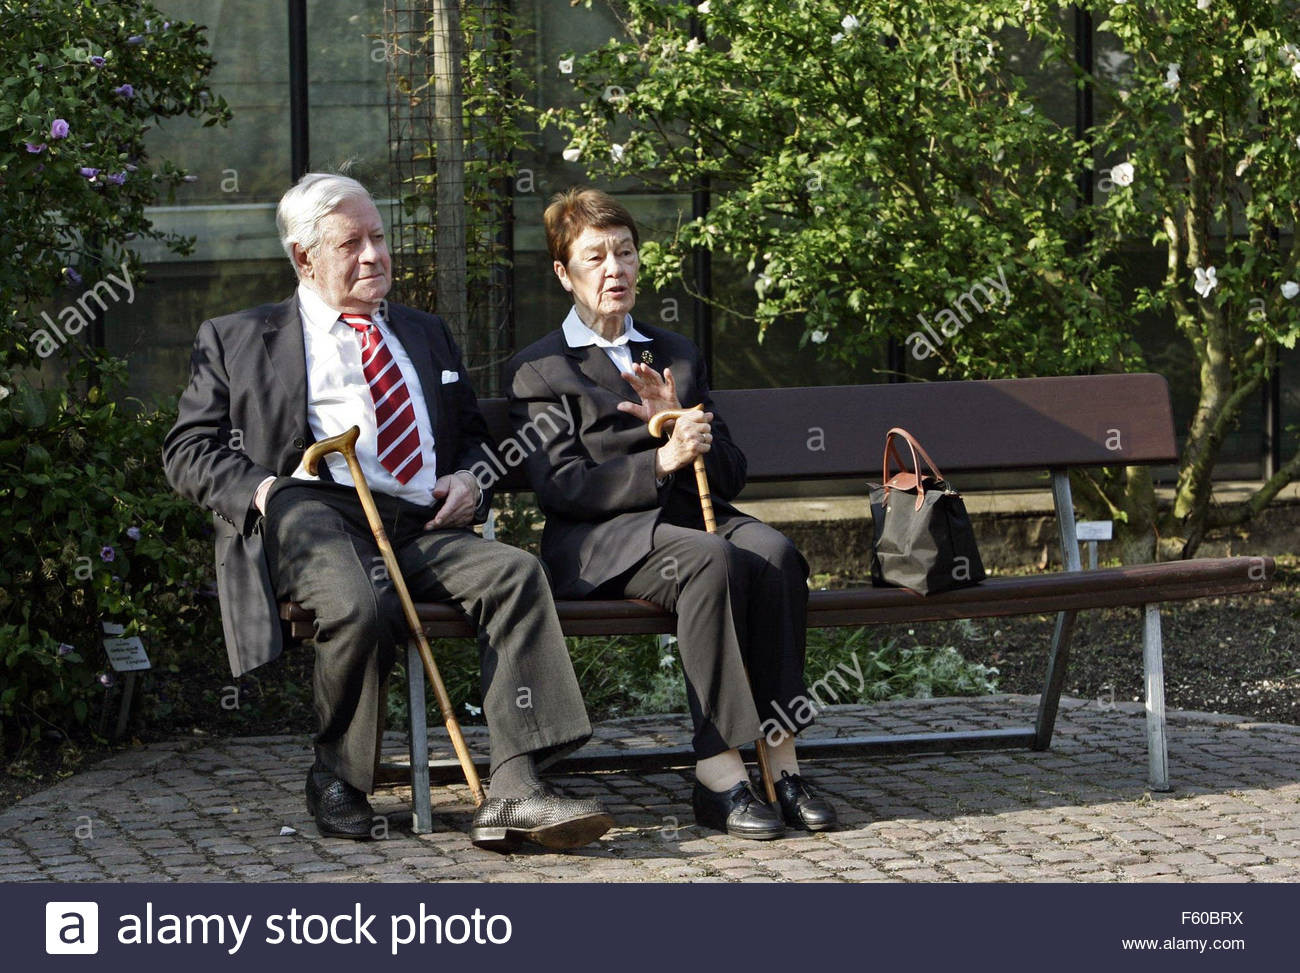 Loki Schmidt Haus  Loki Schmidt and her husband and former Chancellor Helmut